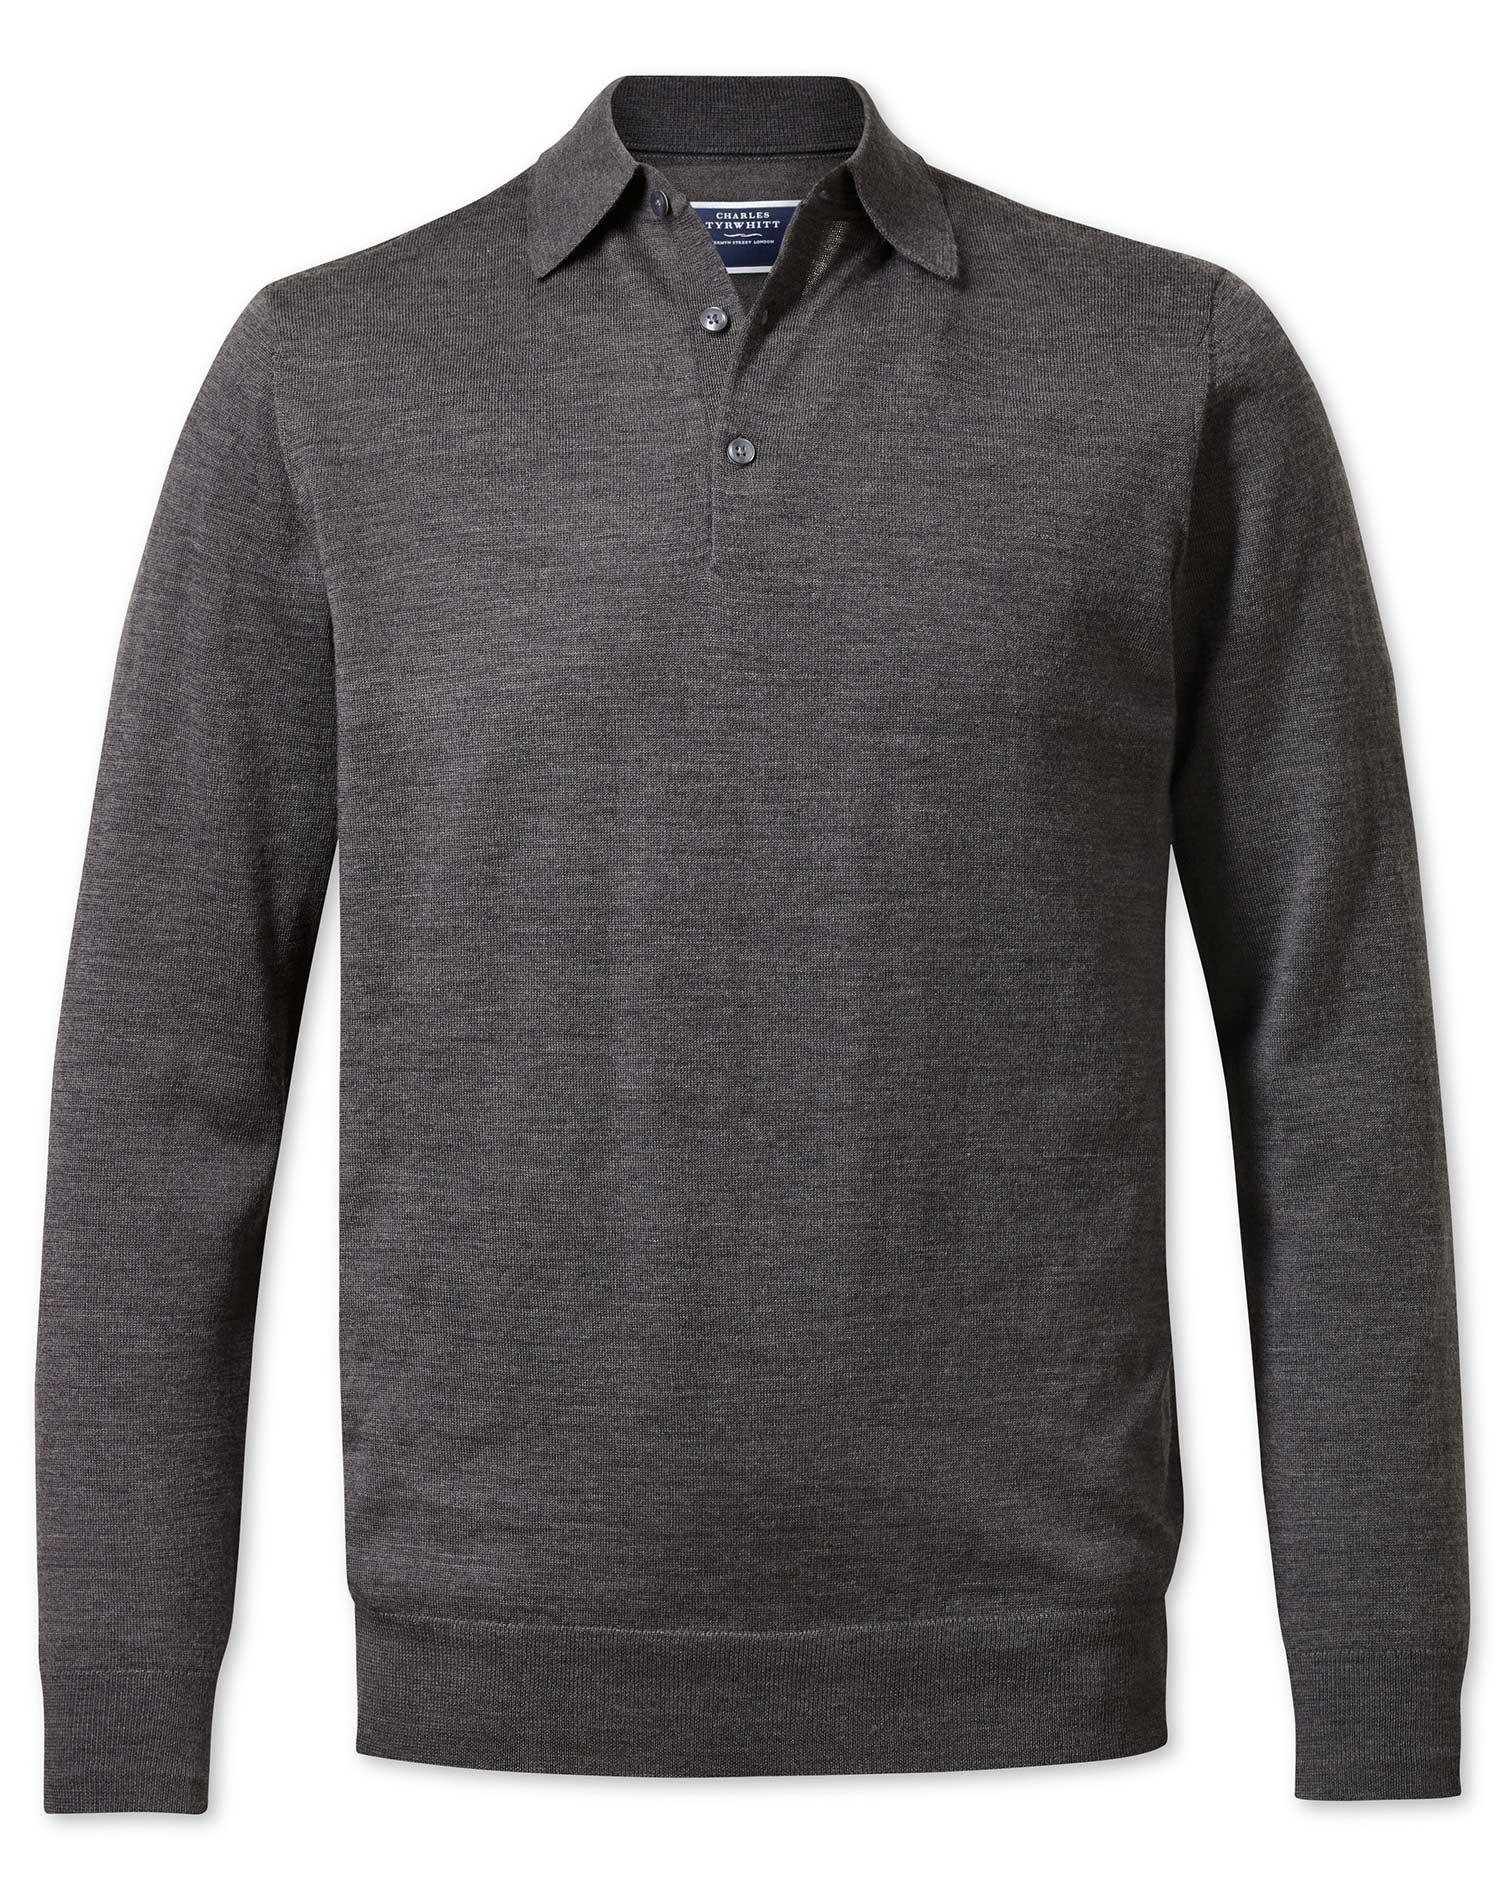 Charcoal Wool Polo Collar Merino Wool Jumper Size XXL by Charles Tyrwhitt